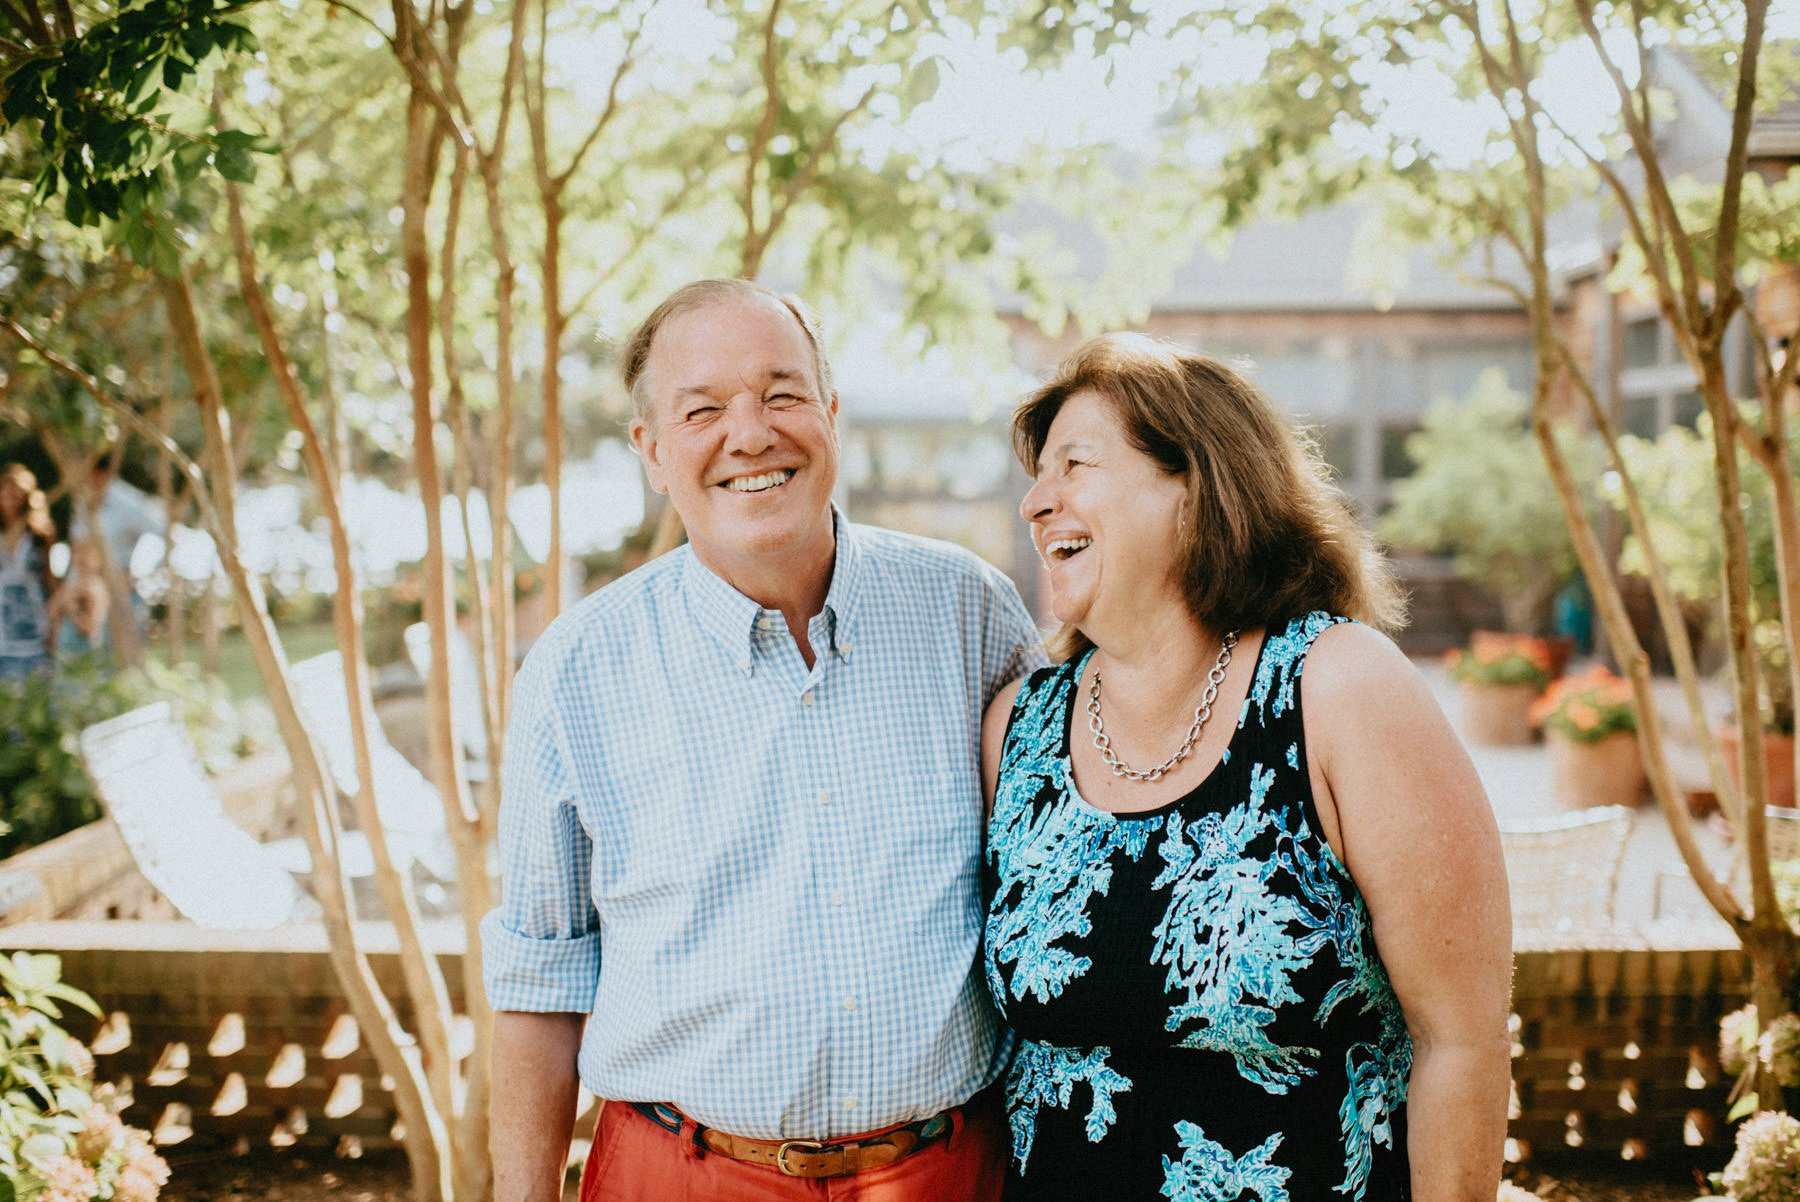 delware-pennsylvania-family-photographer-34.jpg